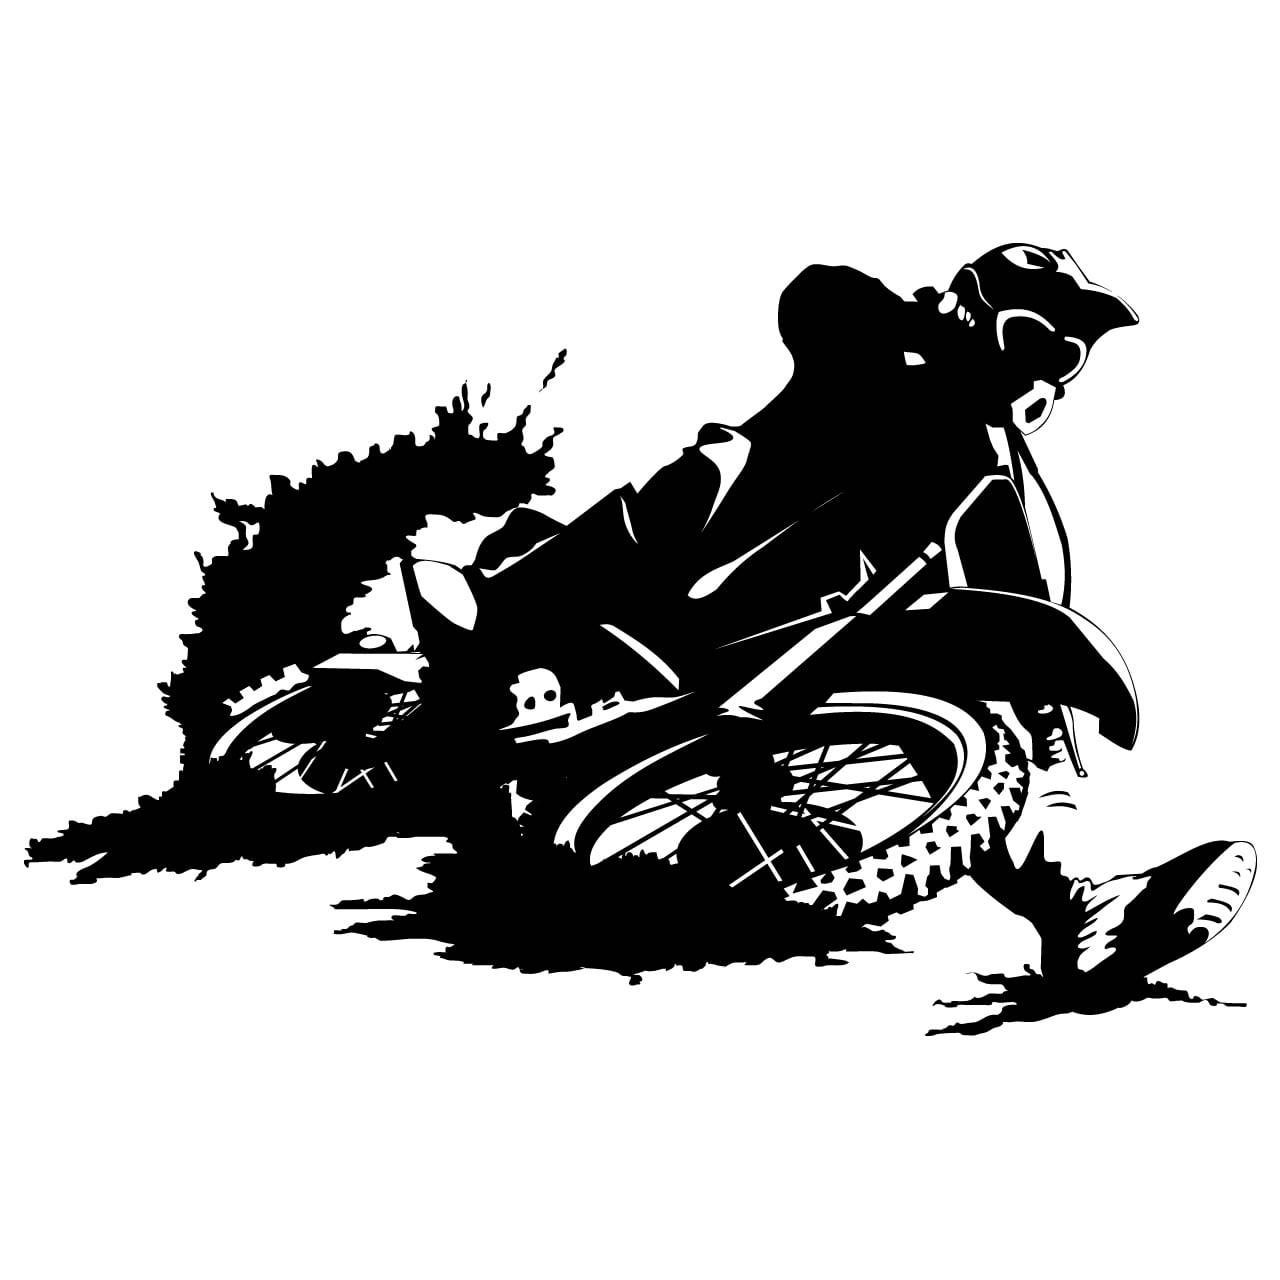 motorbike dirtbike sports wall sticker world of wall wall decal dirt bike personalized boys name vinyl sticker word